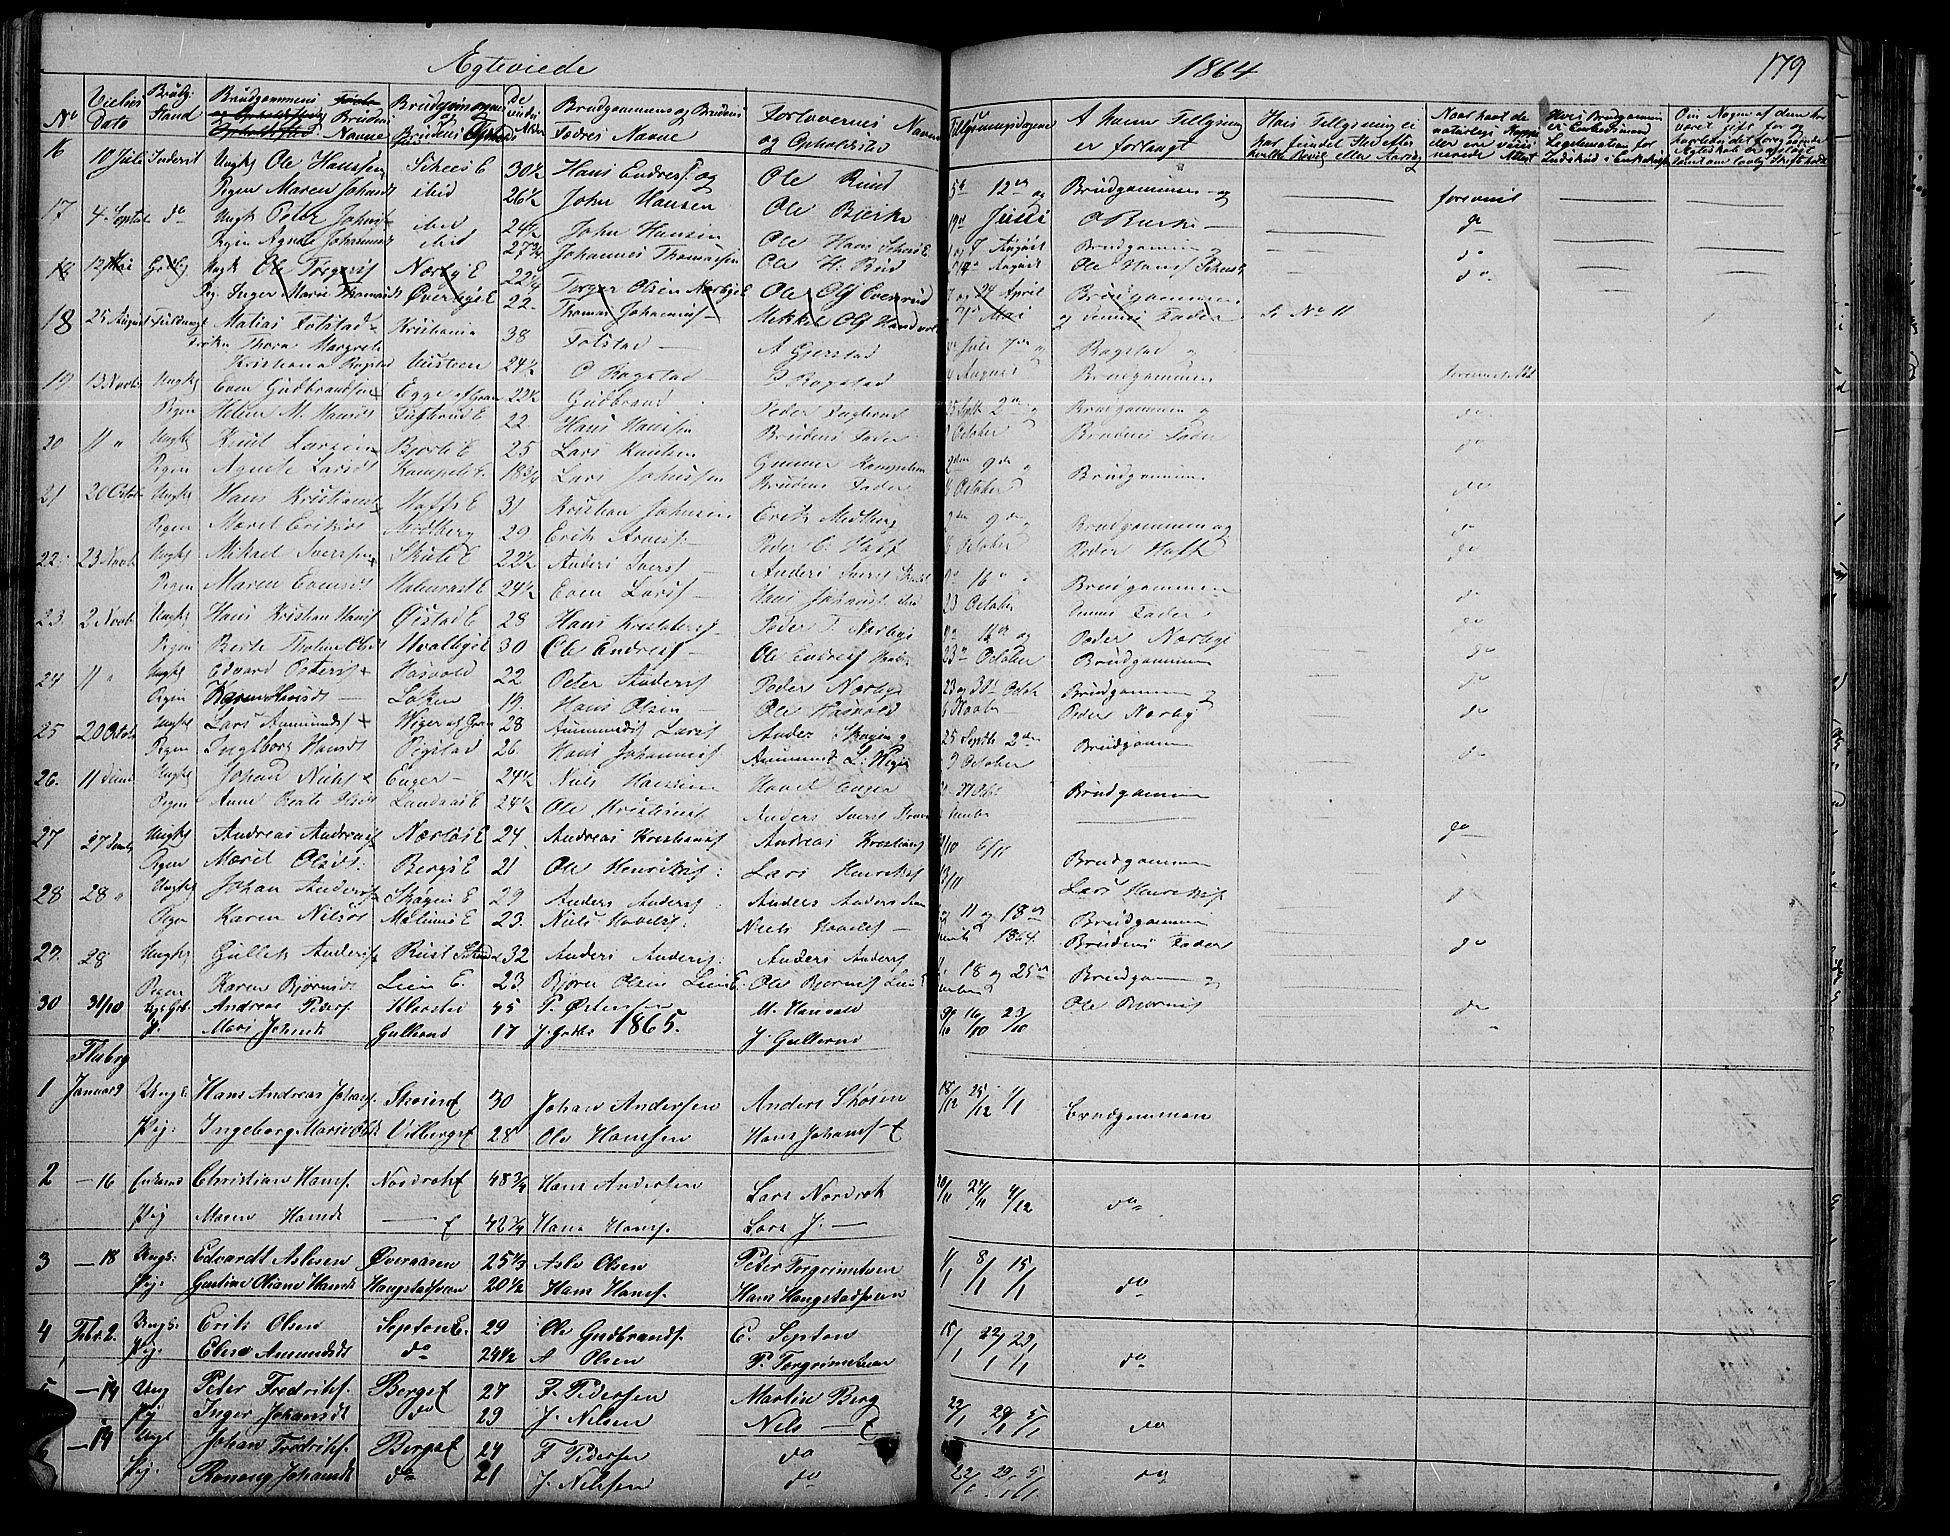 SAH, Søndre Land prestekontor, L/L0001: Klokkerbok nr. 1, 1849-1883, s. 179